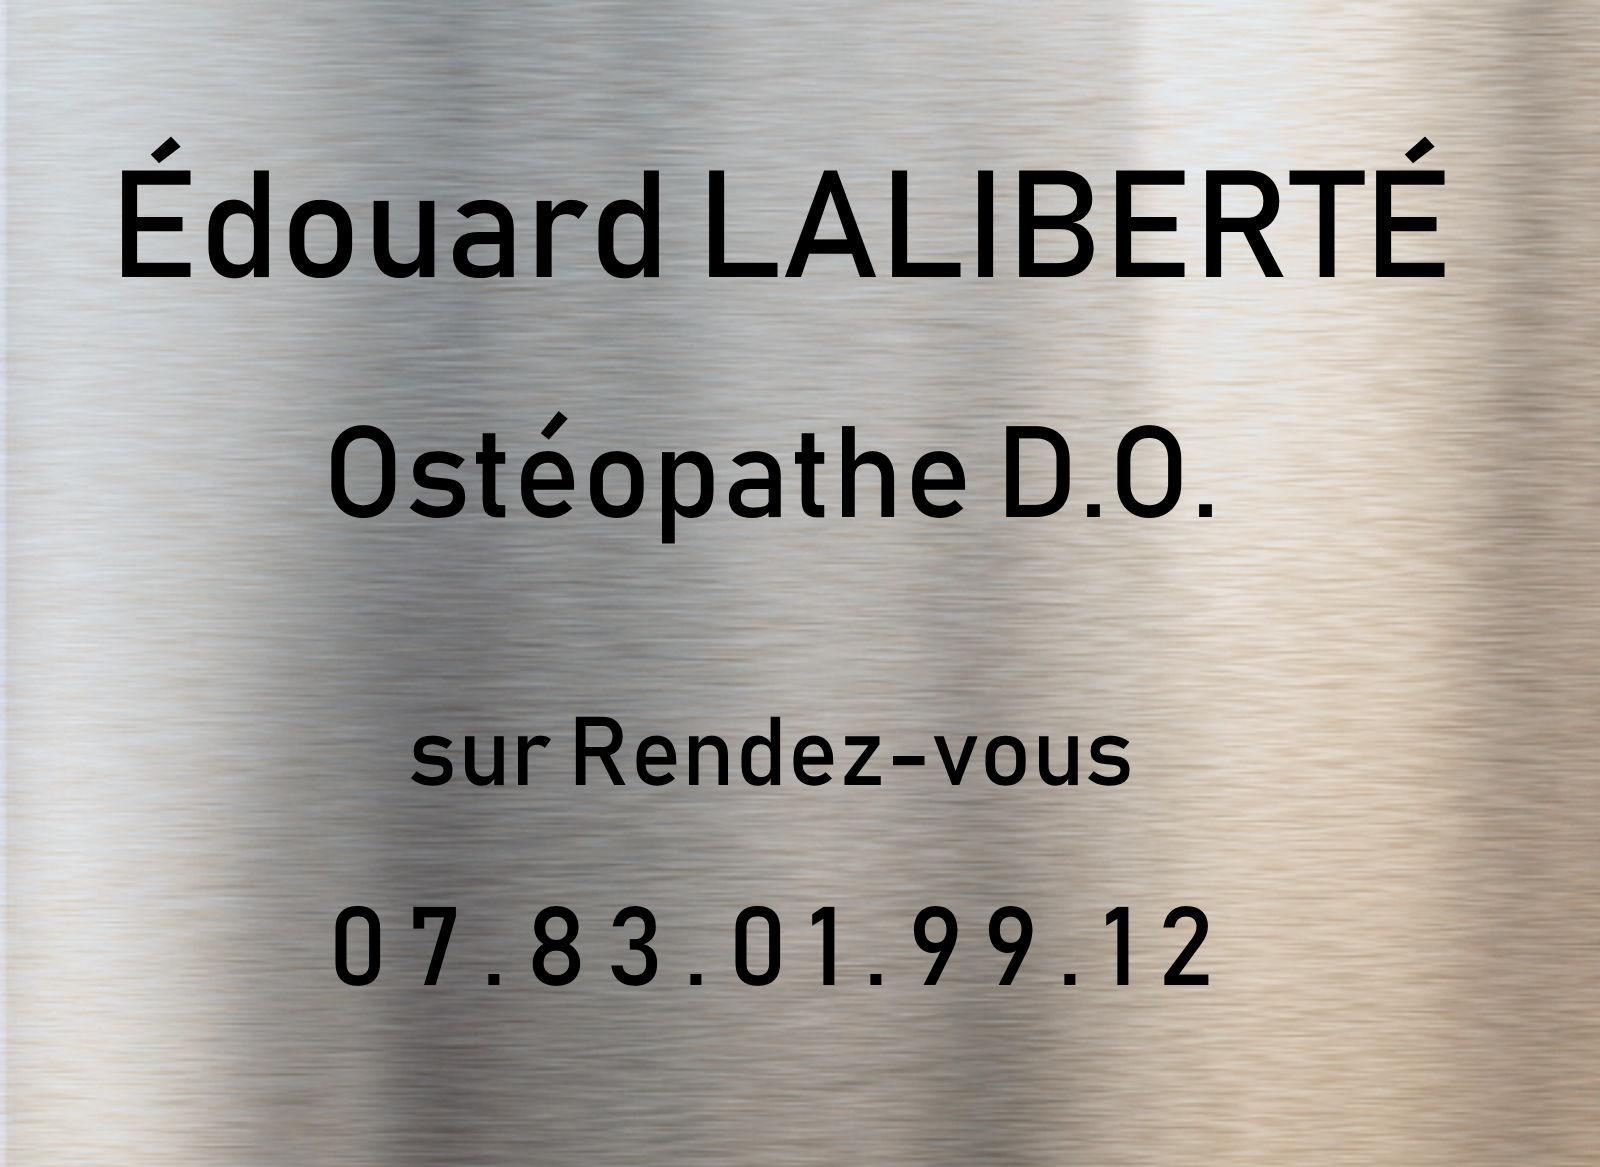 Édouard Laliberté, Ostéopathe, rue Faidherbe Tourcoing